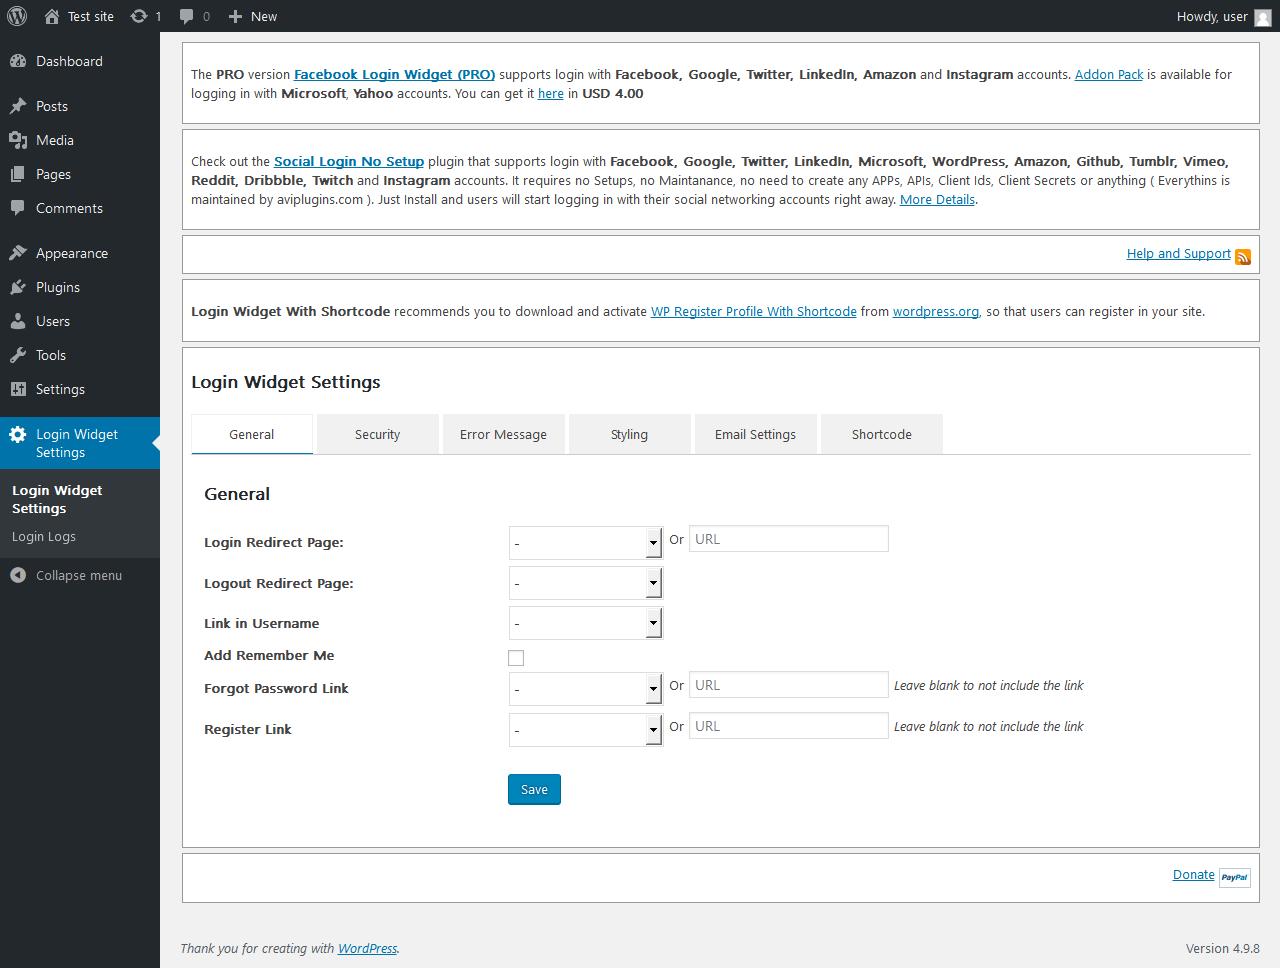 Report - Login Widget With Shortcode 5 8 0 - PluginTests com